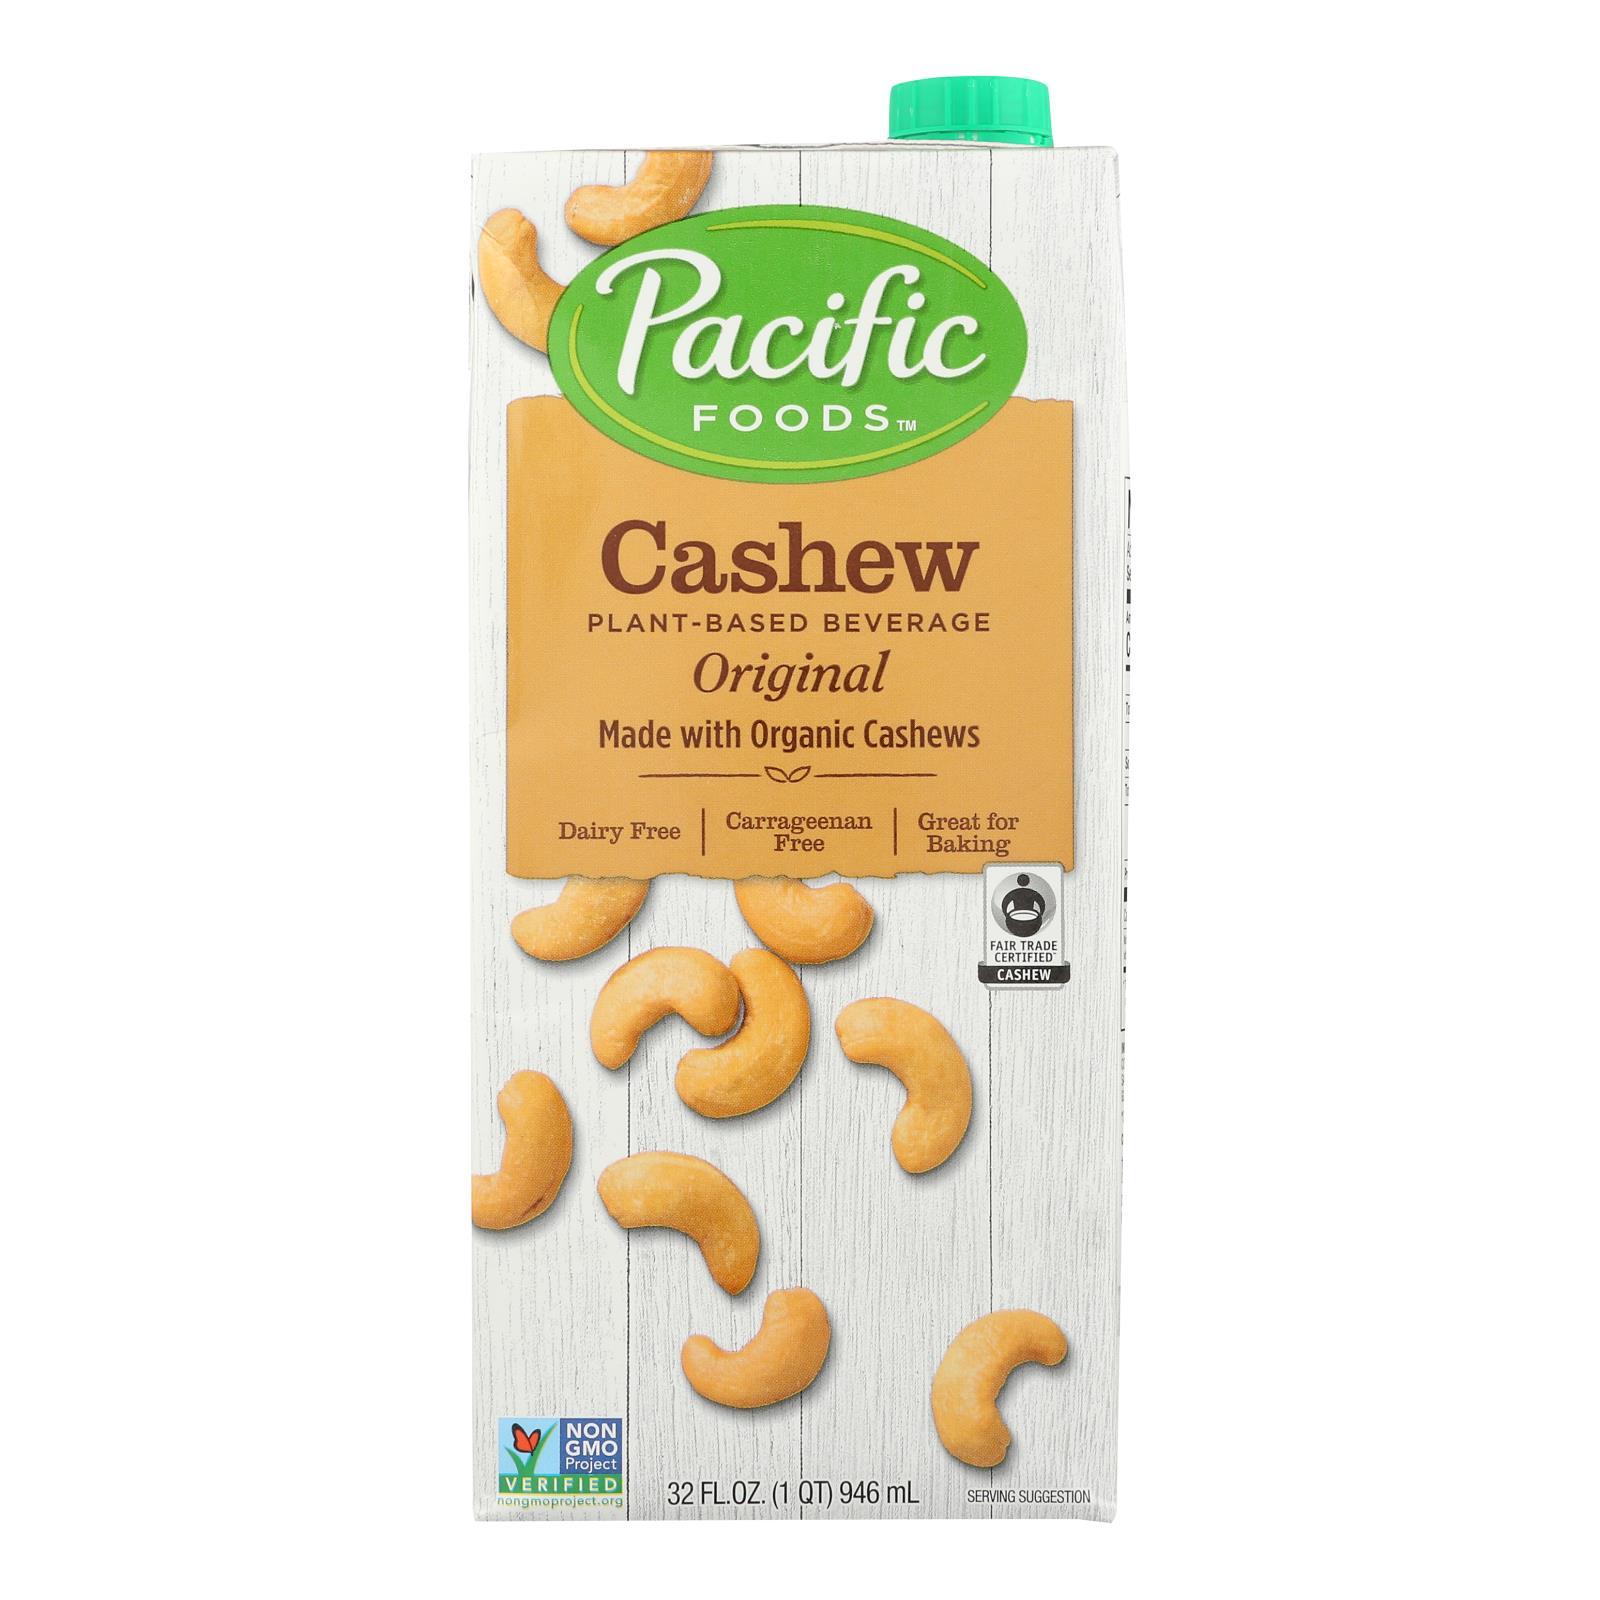 Pacific Natural Foods Cashew Beverage - Organic - Original - Case of 6 - 32 fl oz